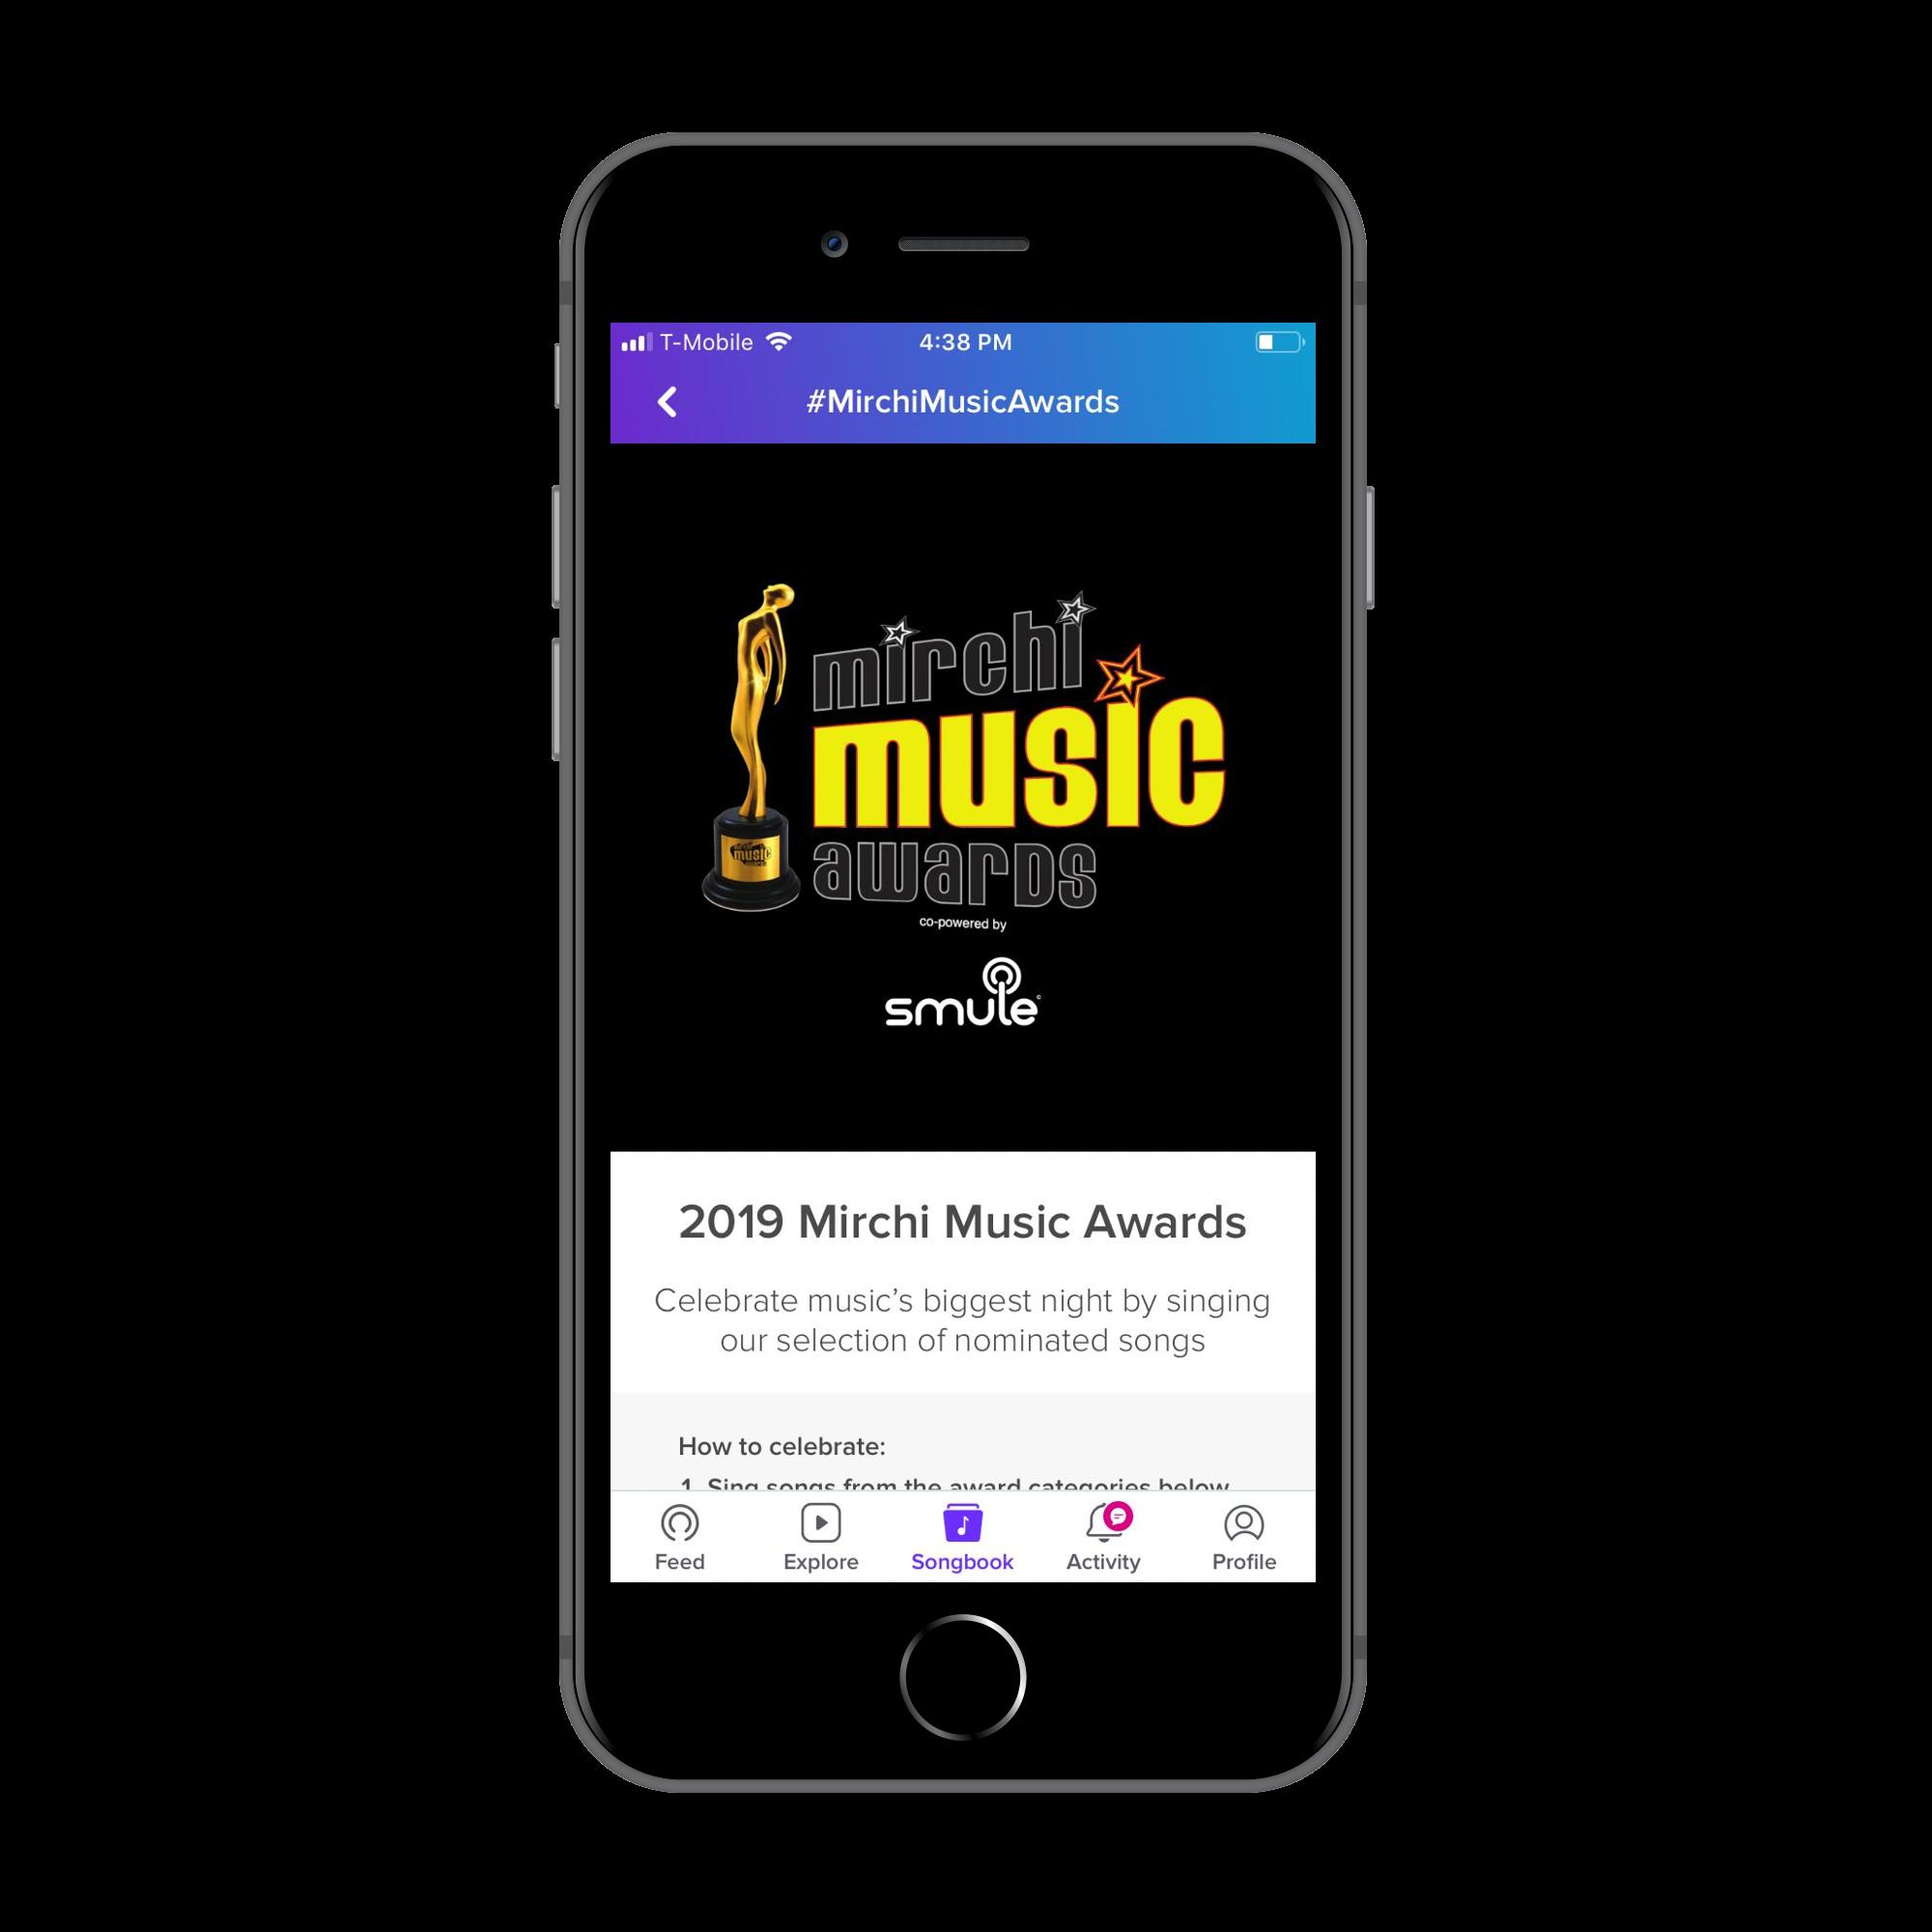 Smule app + Mirchi Music Awards